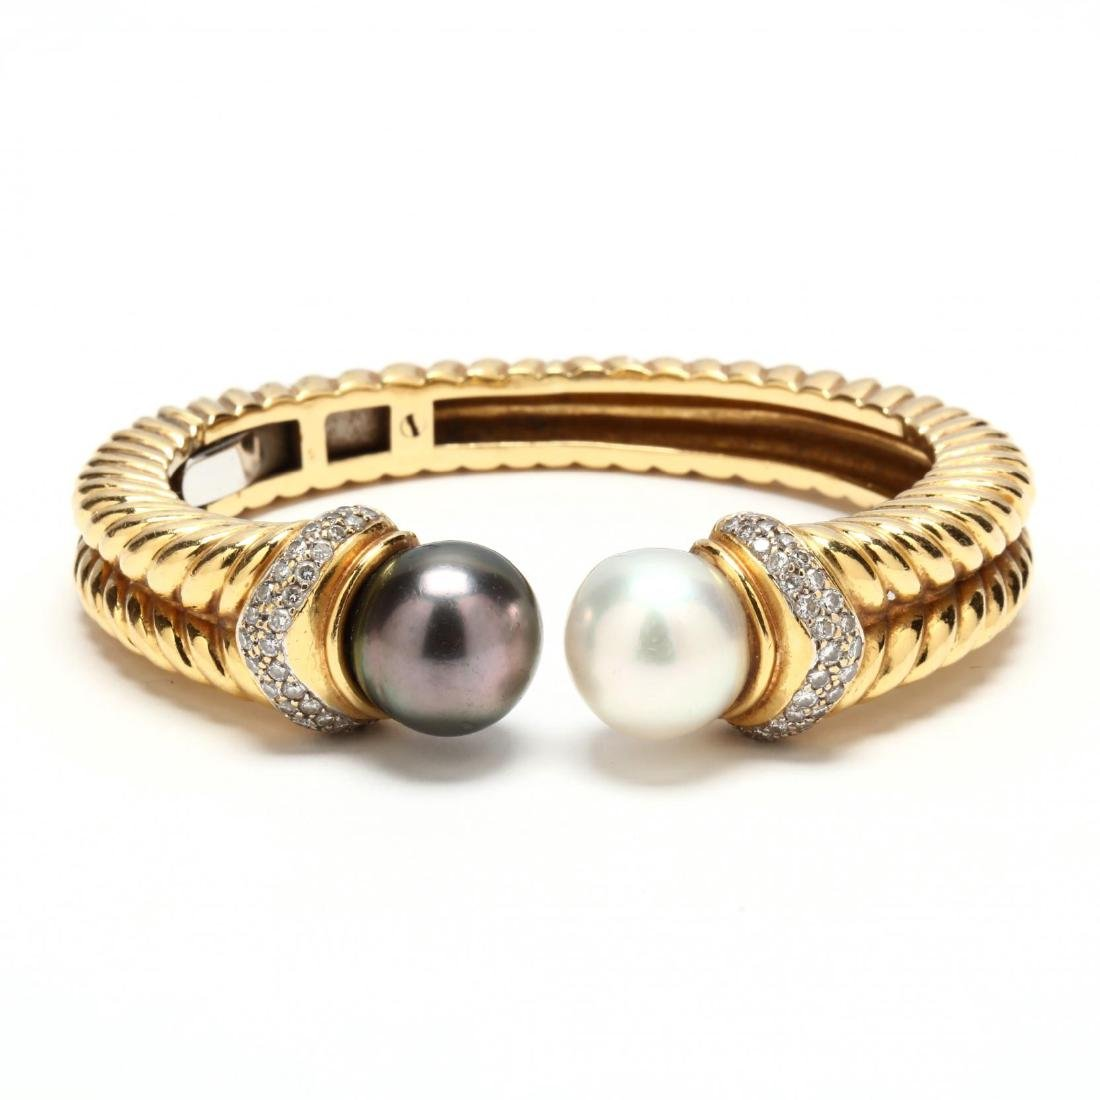 18KT Gold, Pearl, and Diamond Bracelet, Jye's